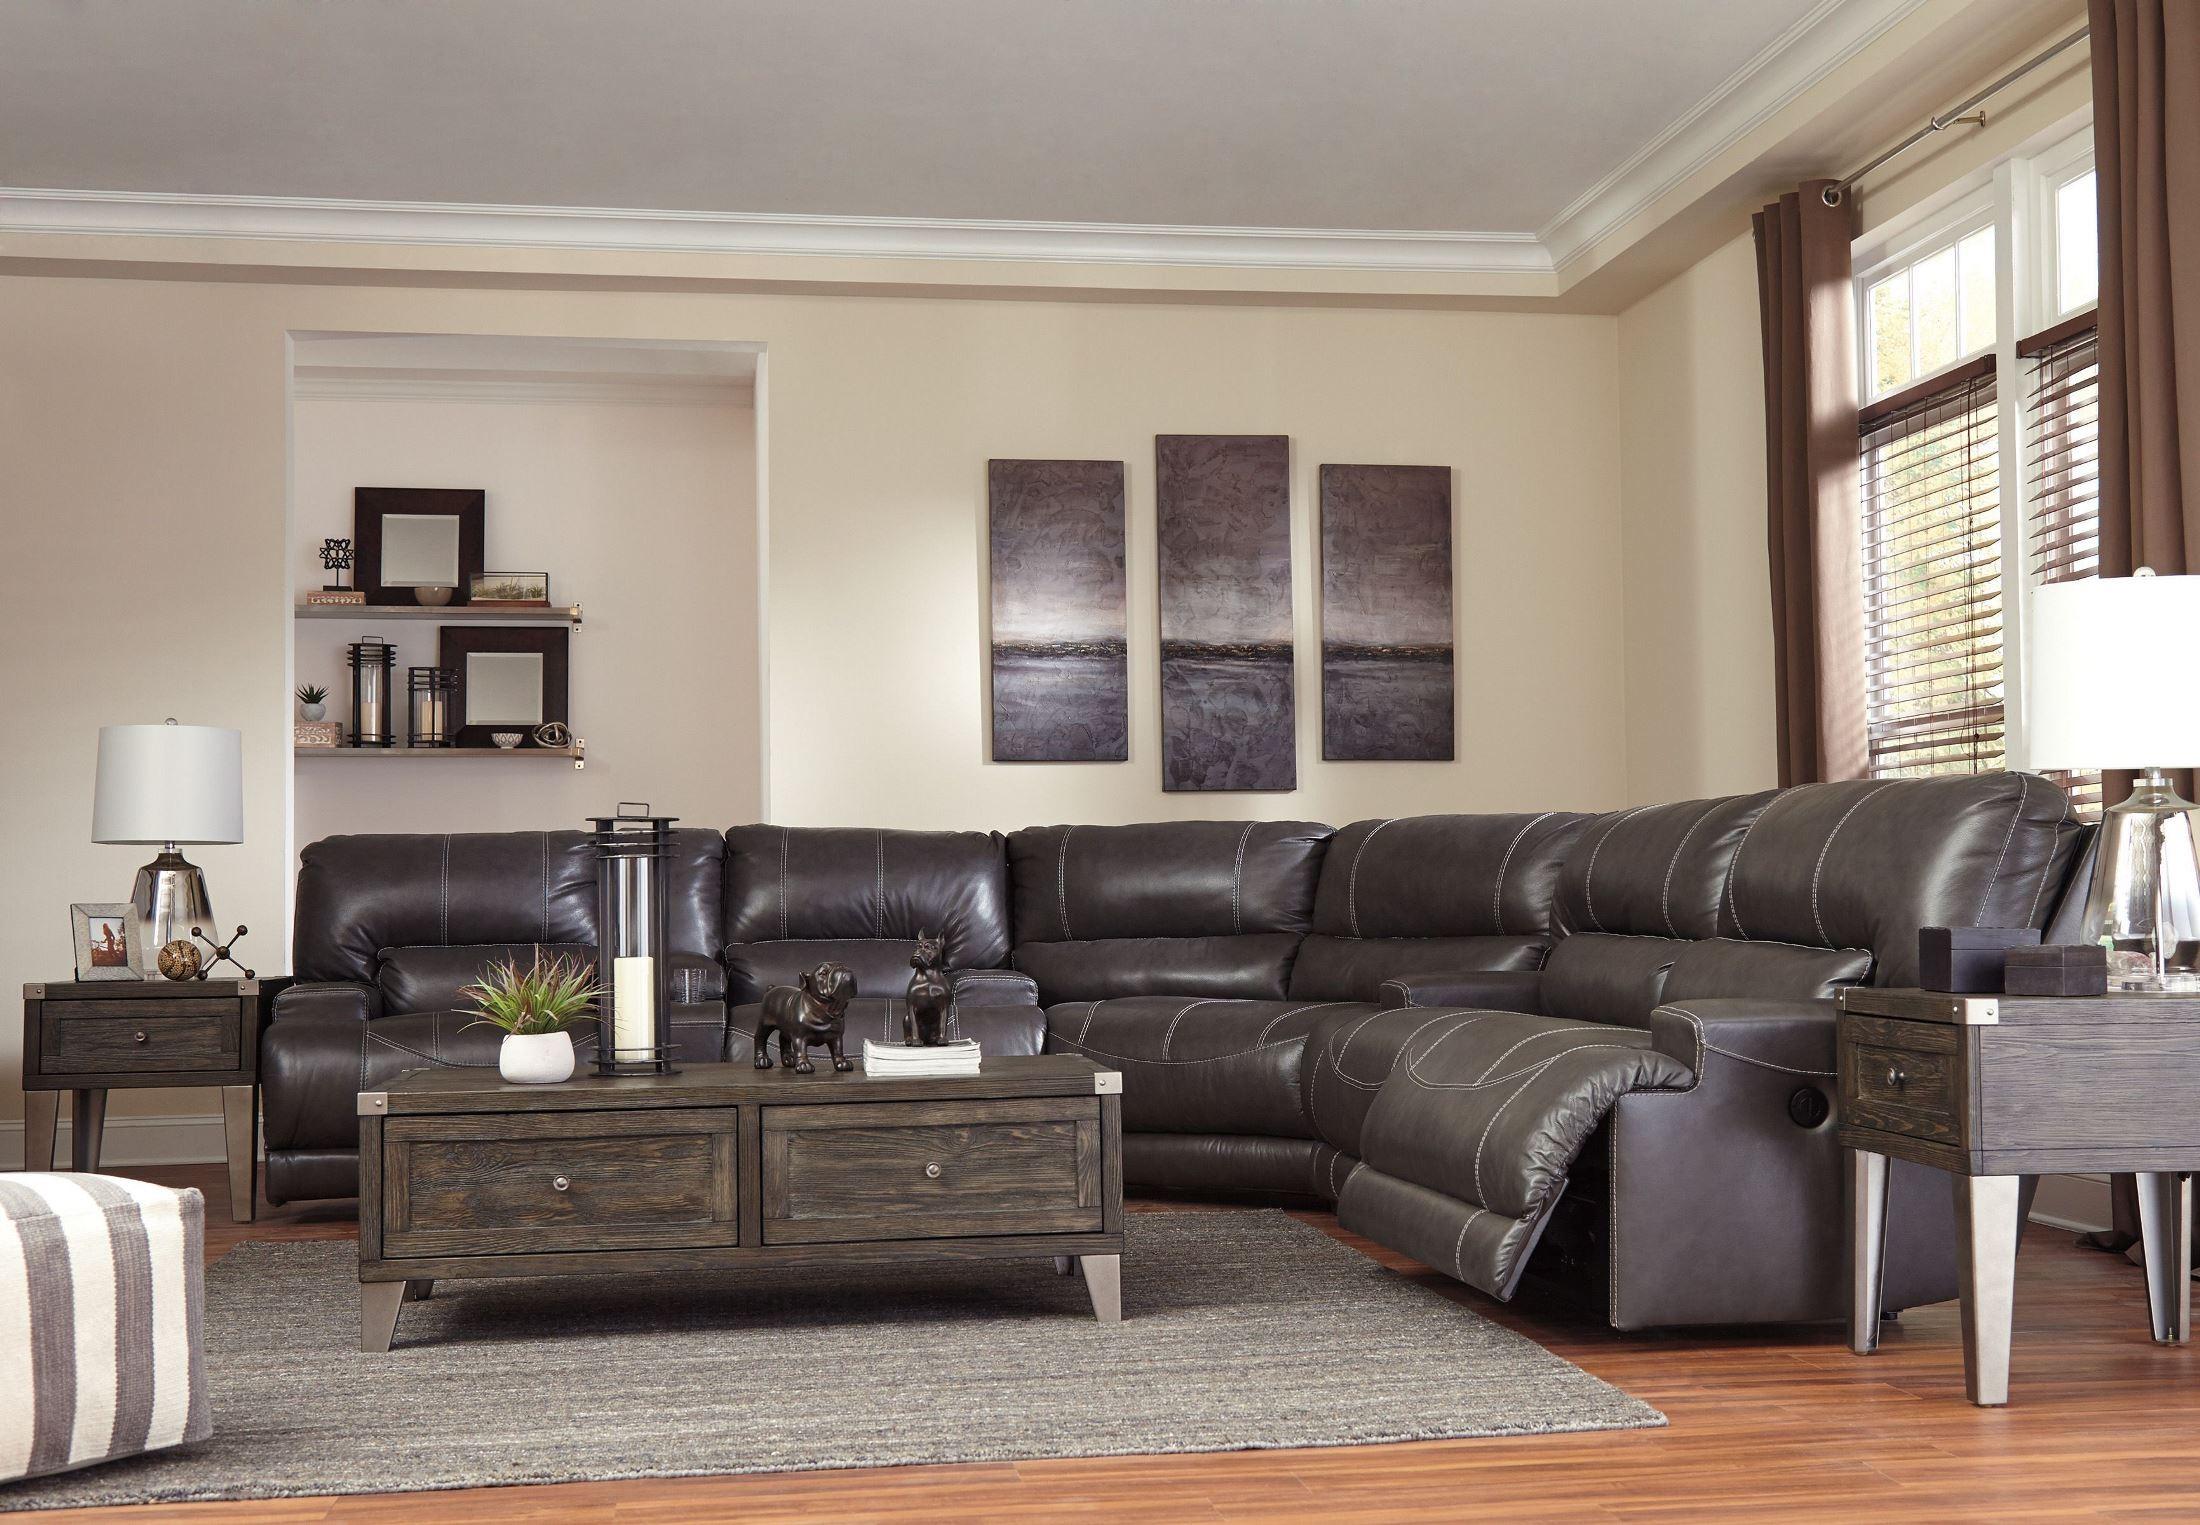 McCaskill Gray 2 Seat Reclining Sofa from Ashley | Coleman ...